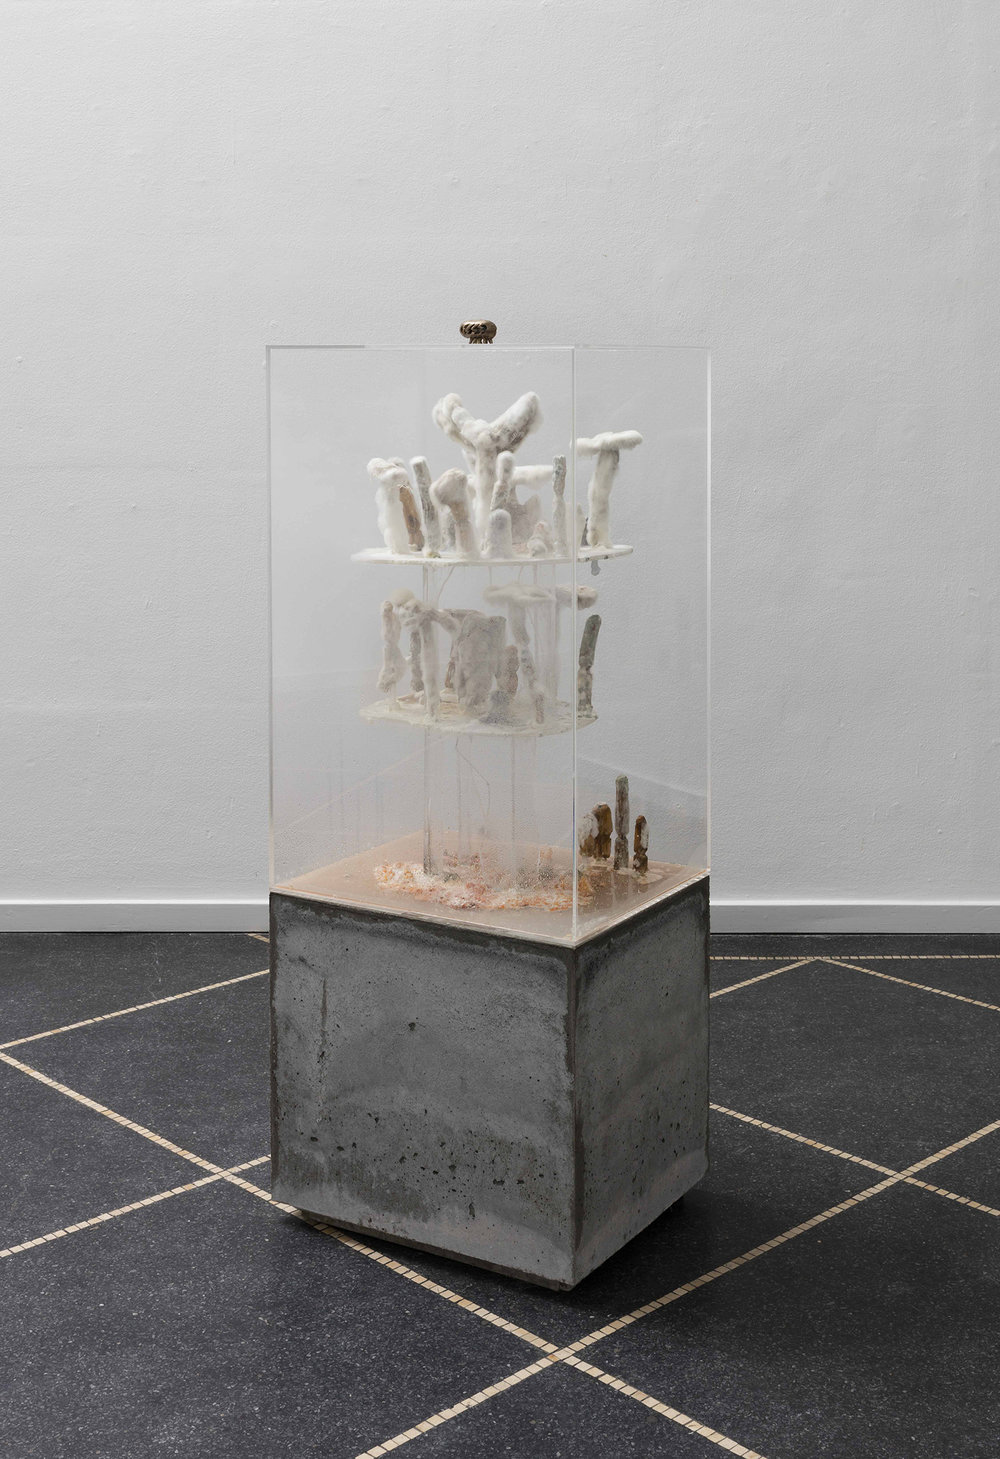 SI, Infrastructure, 2018 (Bronze, klar akryl, vand, palmeblade, plantefrø, skimmelsvamp, beton. 130 x 50 x 40 cm). Foto:Anders Sune Berg © Galleri Susanne Ottesen.